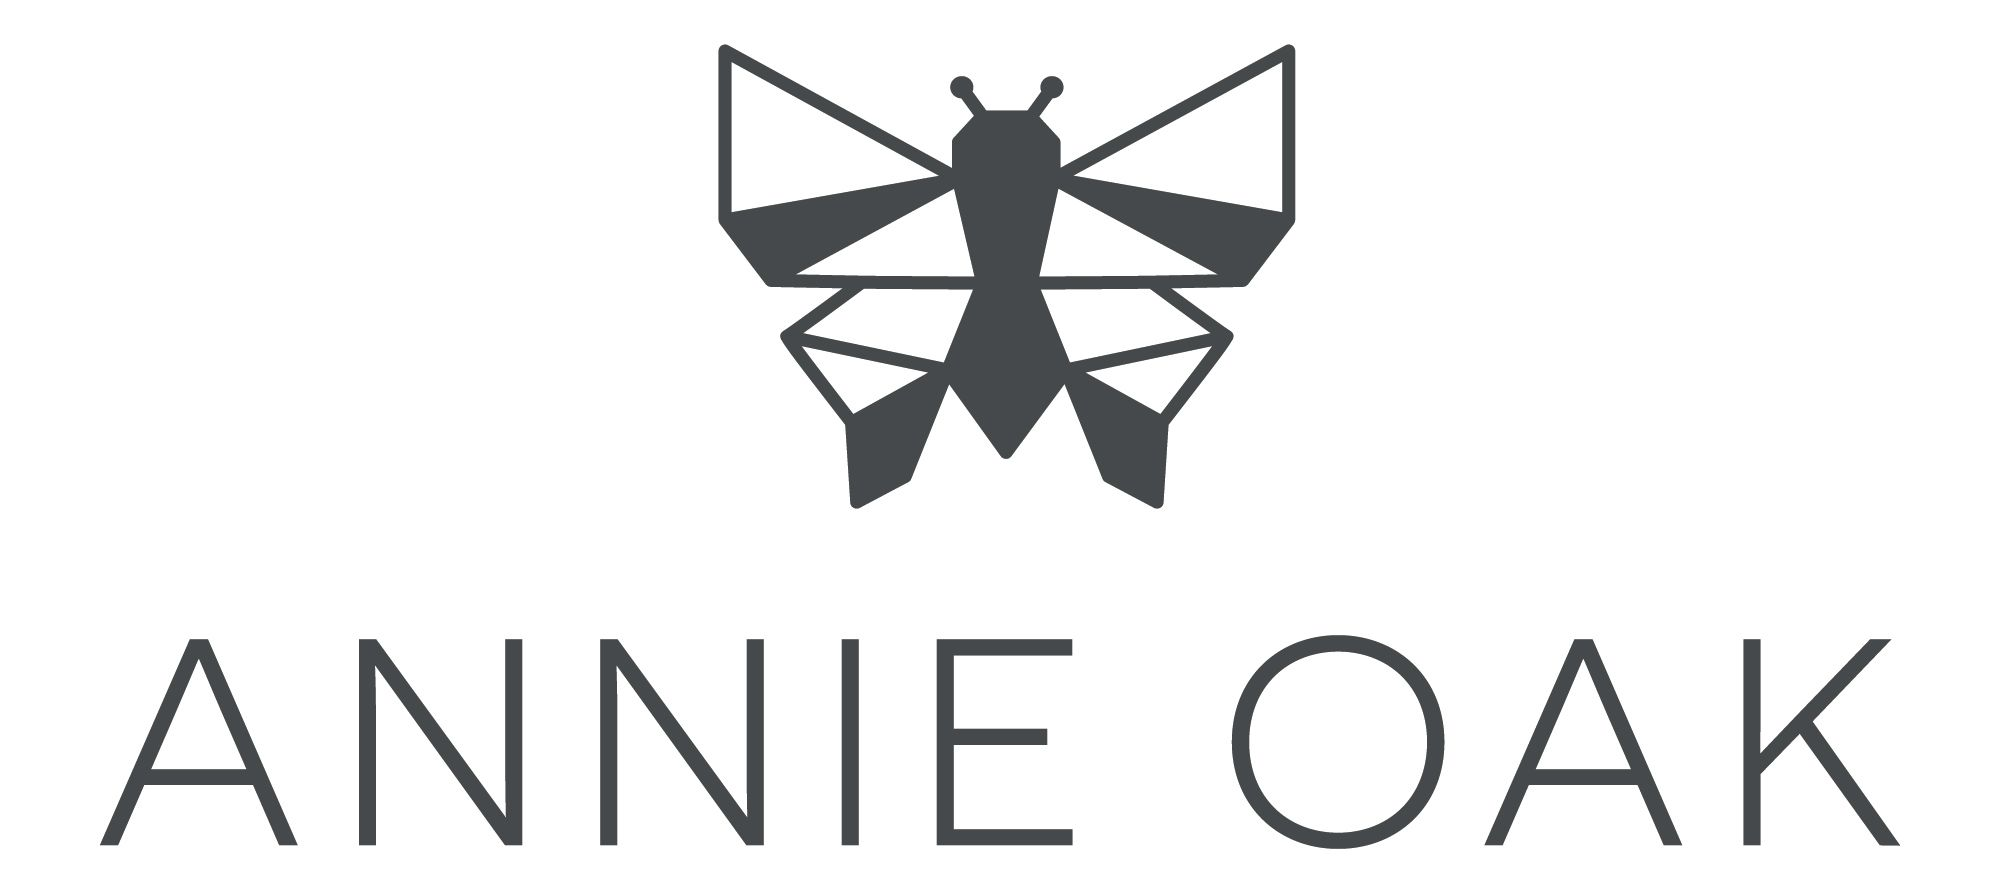 Annie Oak Limited